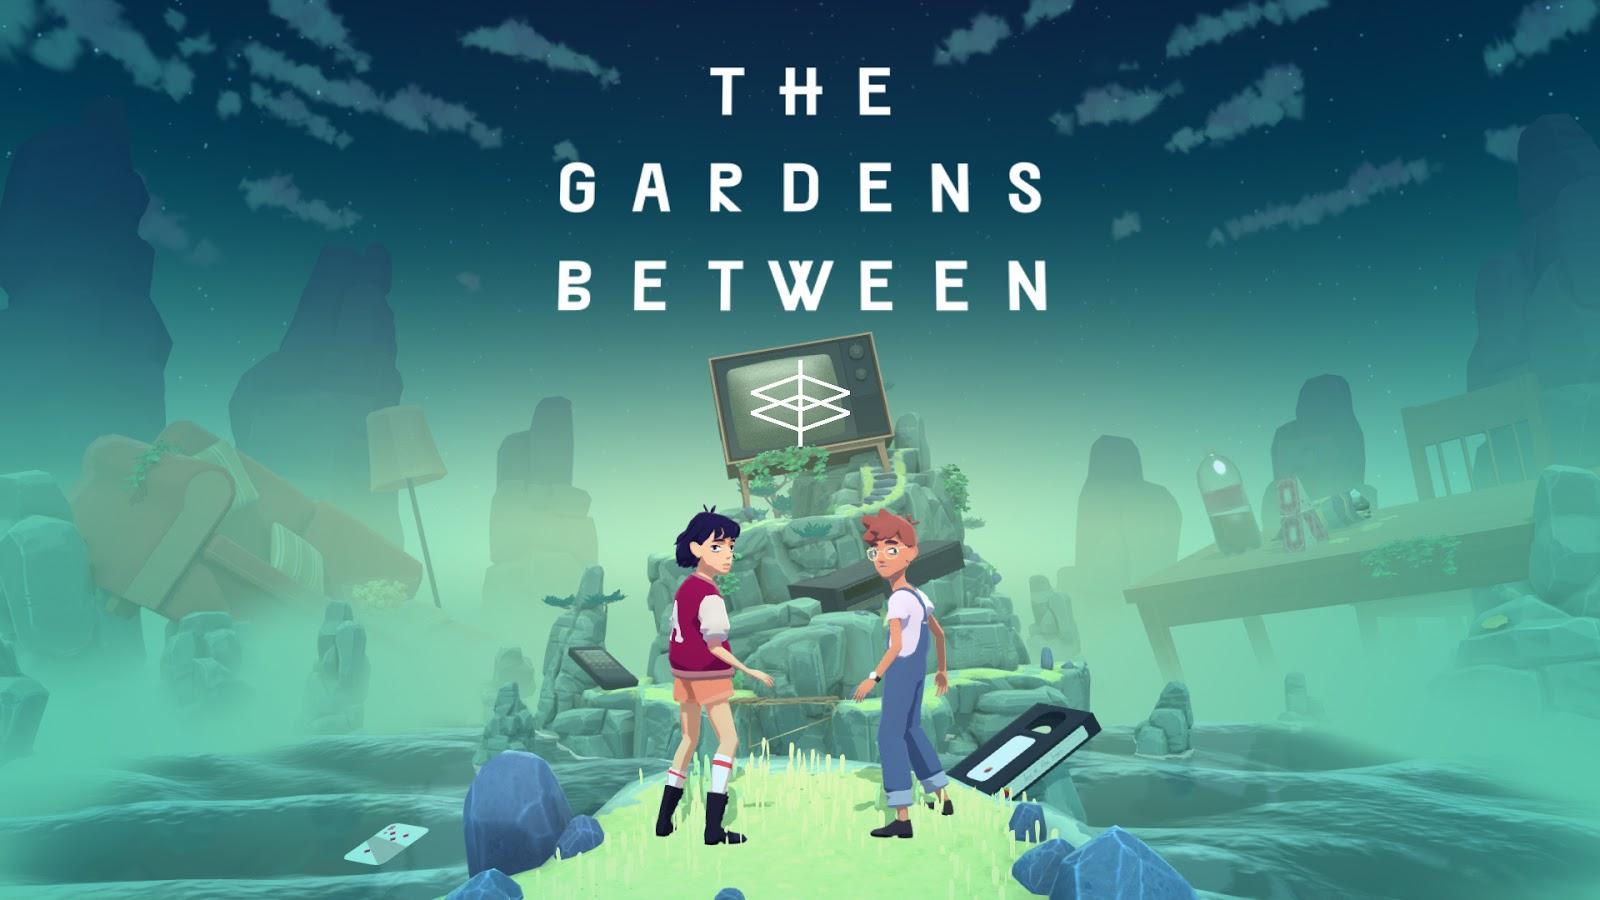 The Gardens Between Screenshot 0.jpg